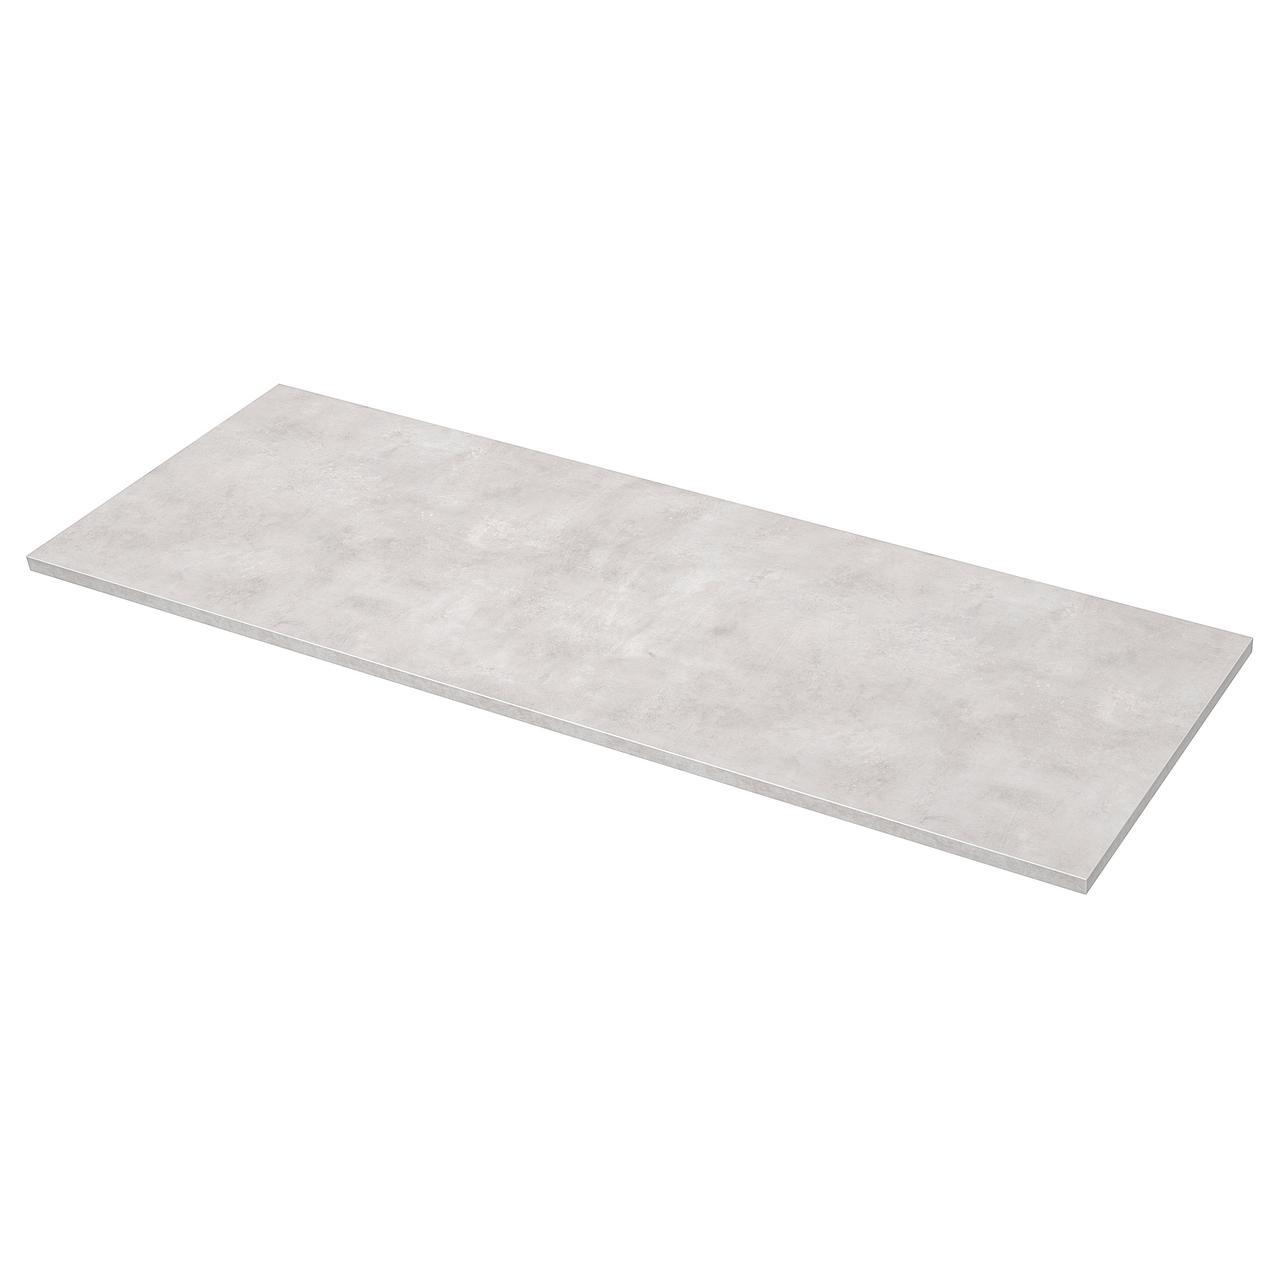 ЭКБАККЕН Столешница, светло-серый под бетон